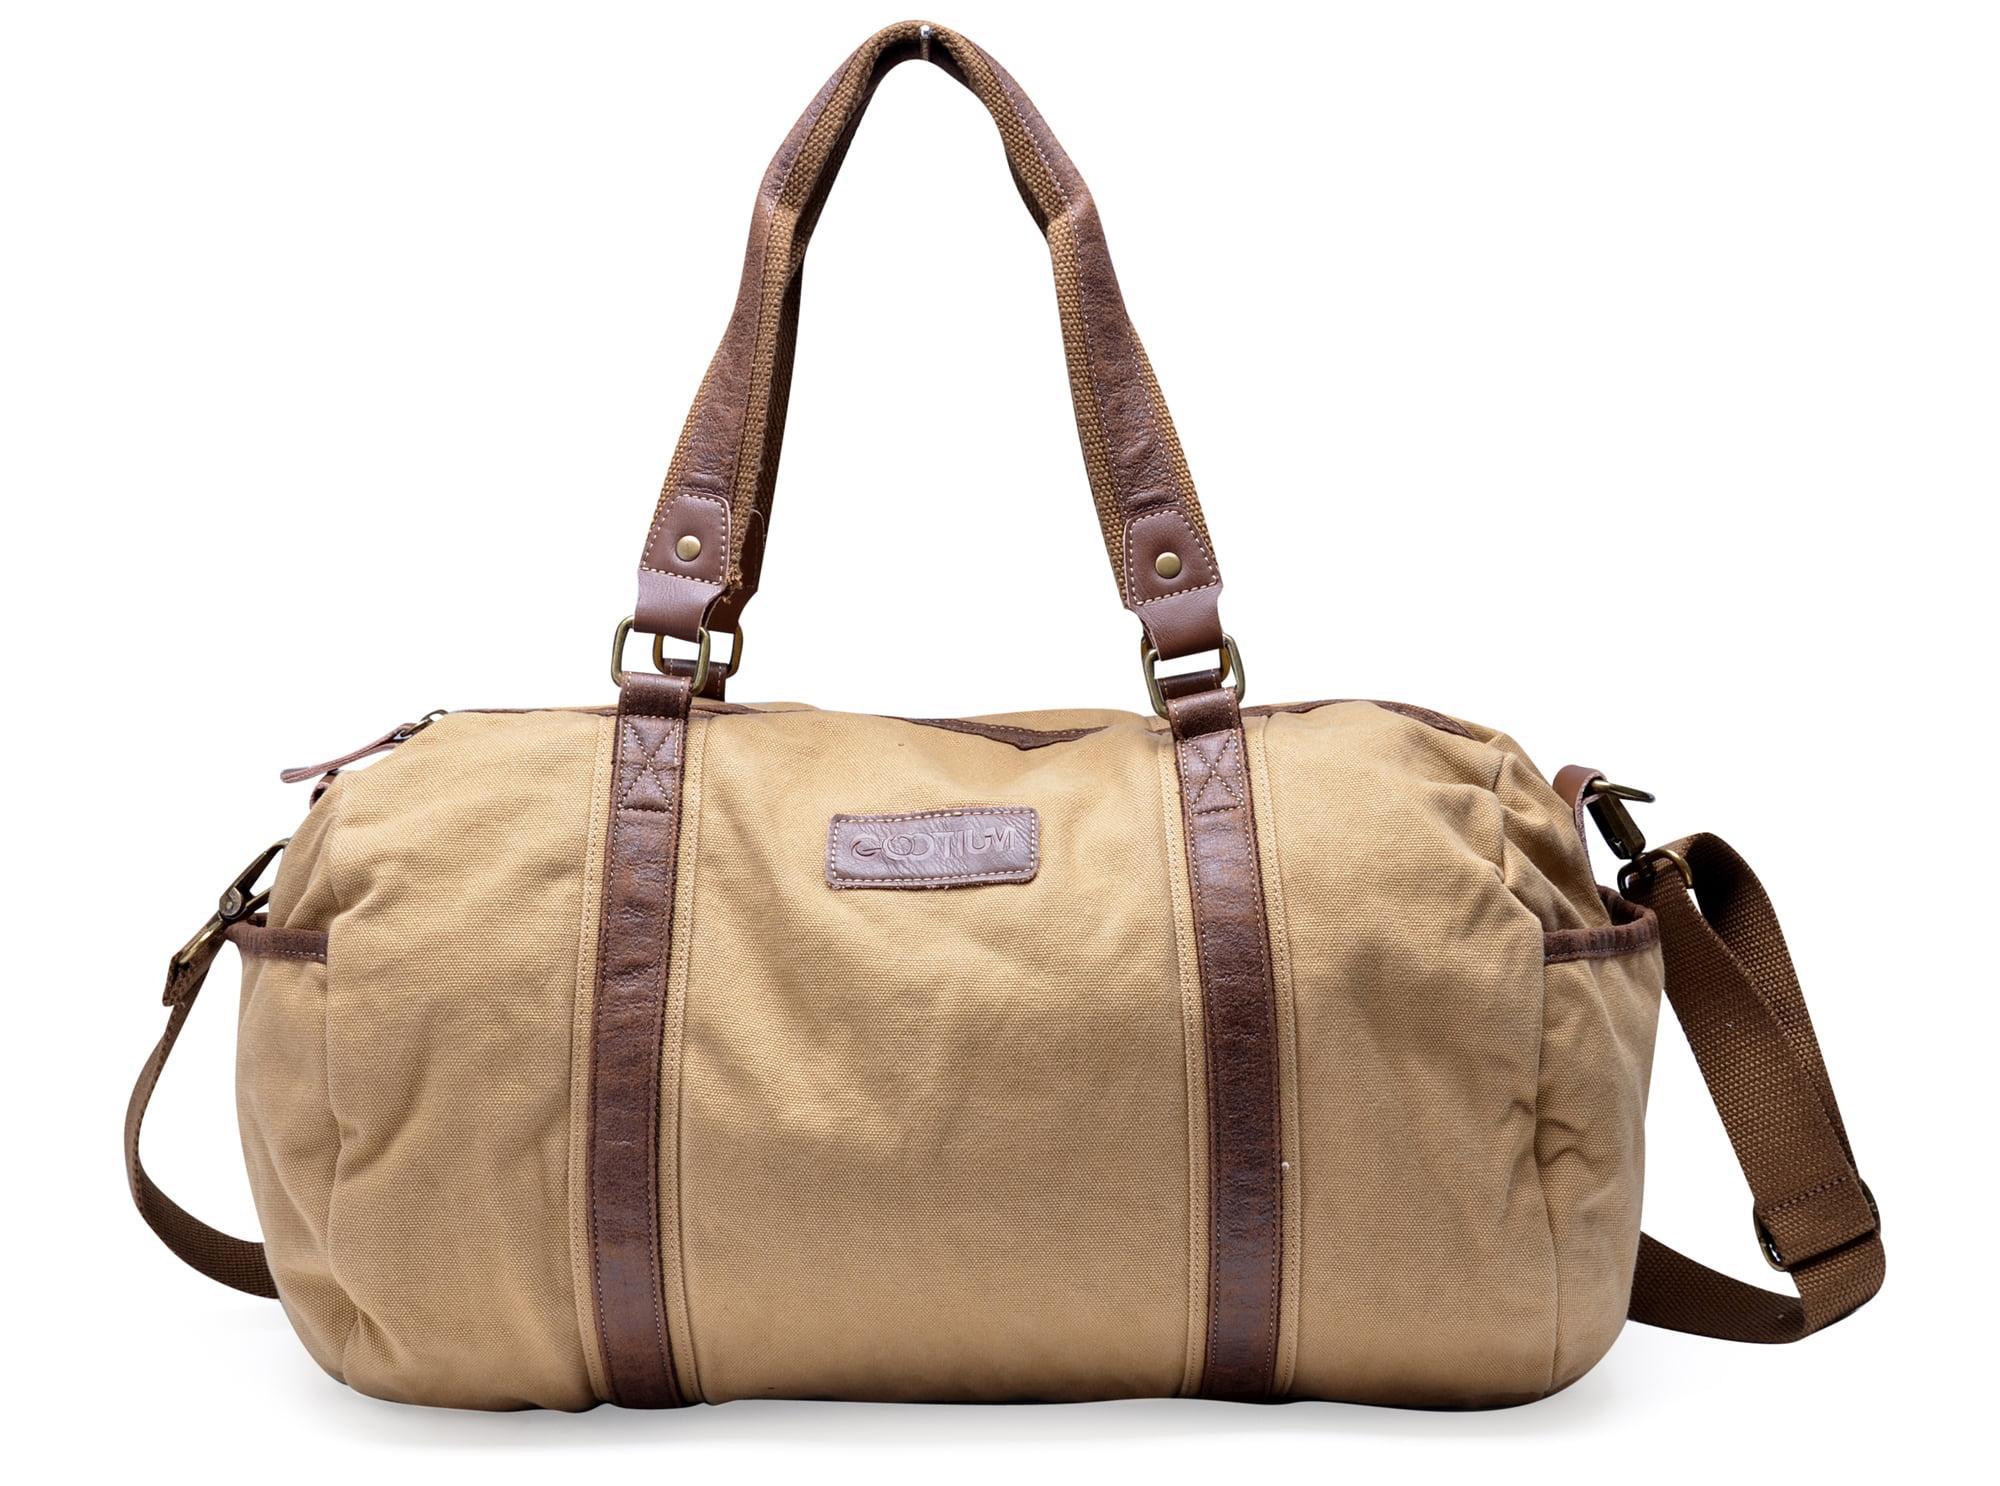 Gootium Vintage Canvas Duffel Bag Travel Tote Shoulder Gym Bag Weekend Bag